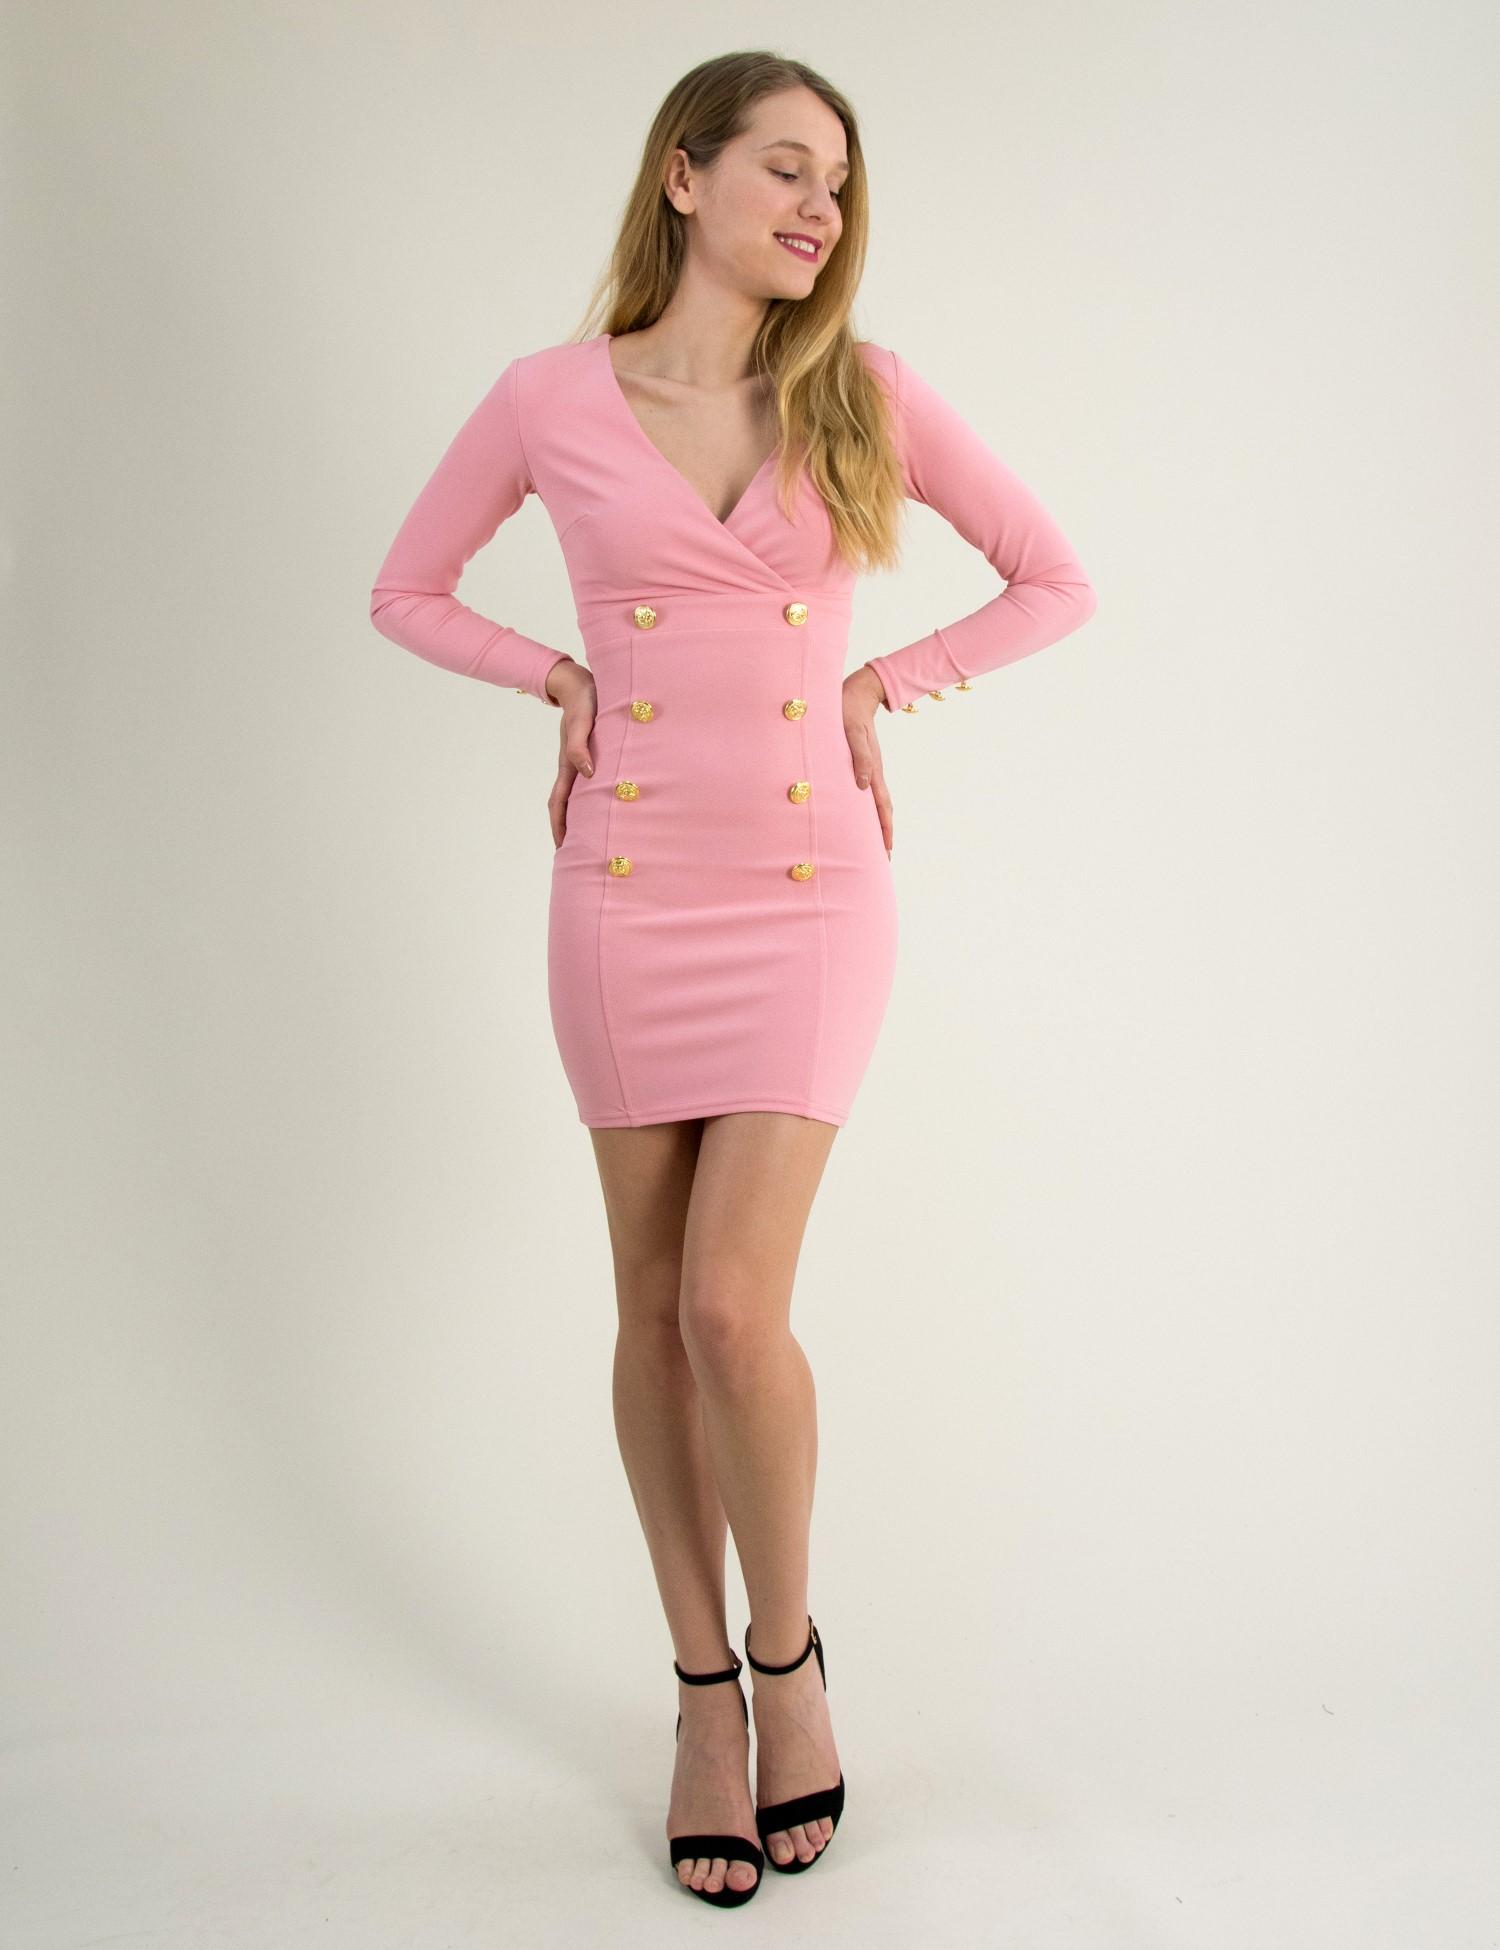 fc514a346b91 Γυναικεία   Ρούχα   Φορέματα   Καθημερινά   ΦΟΡΕΜΑ ΜΕ ΠΛΕΚΤΟ ΜΠΟΥΣΤΟ ...